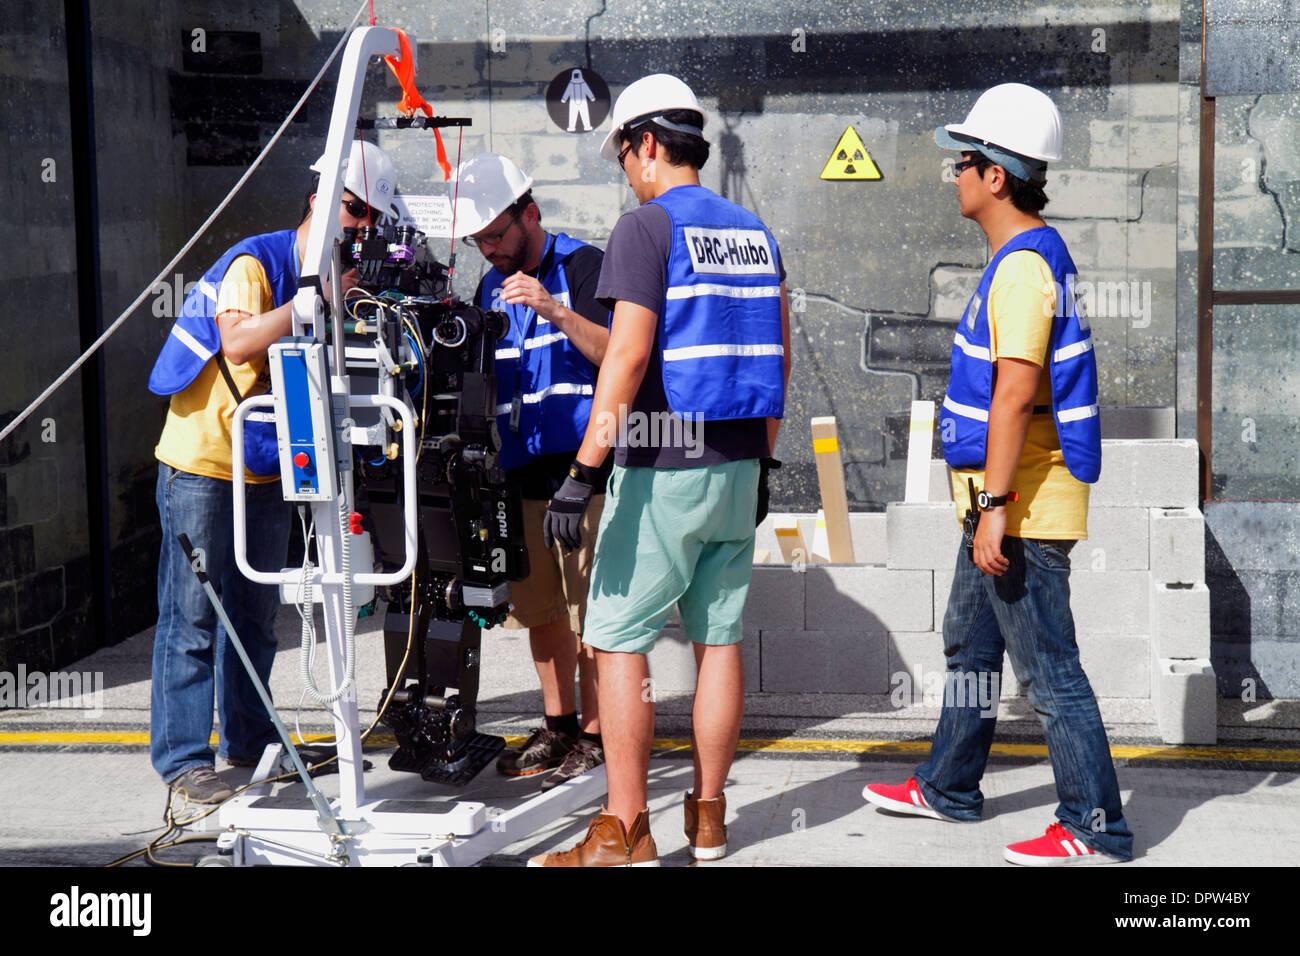 Miami Homestead Florida Speedway DARPA Robotics Challenge Trials remote controlled robot robots disaster response test engineer - Stock Image